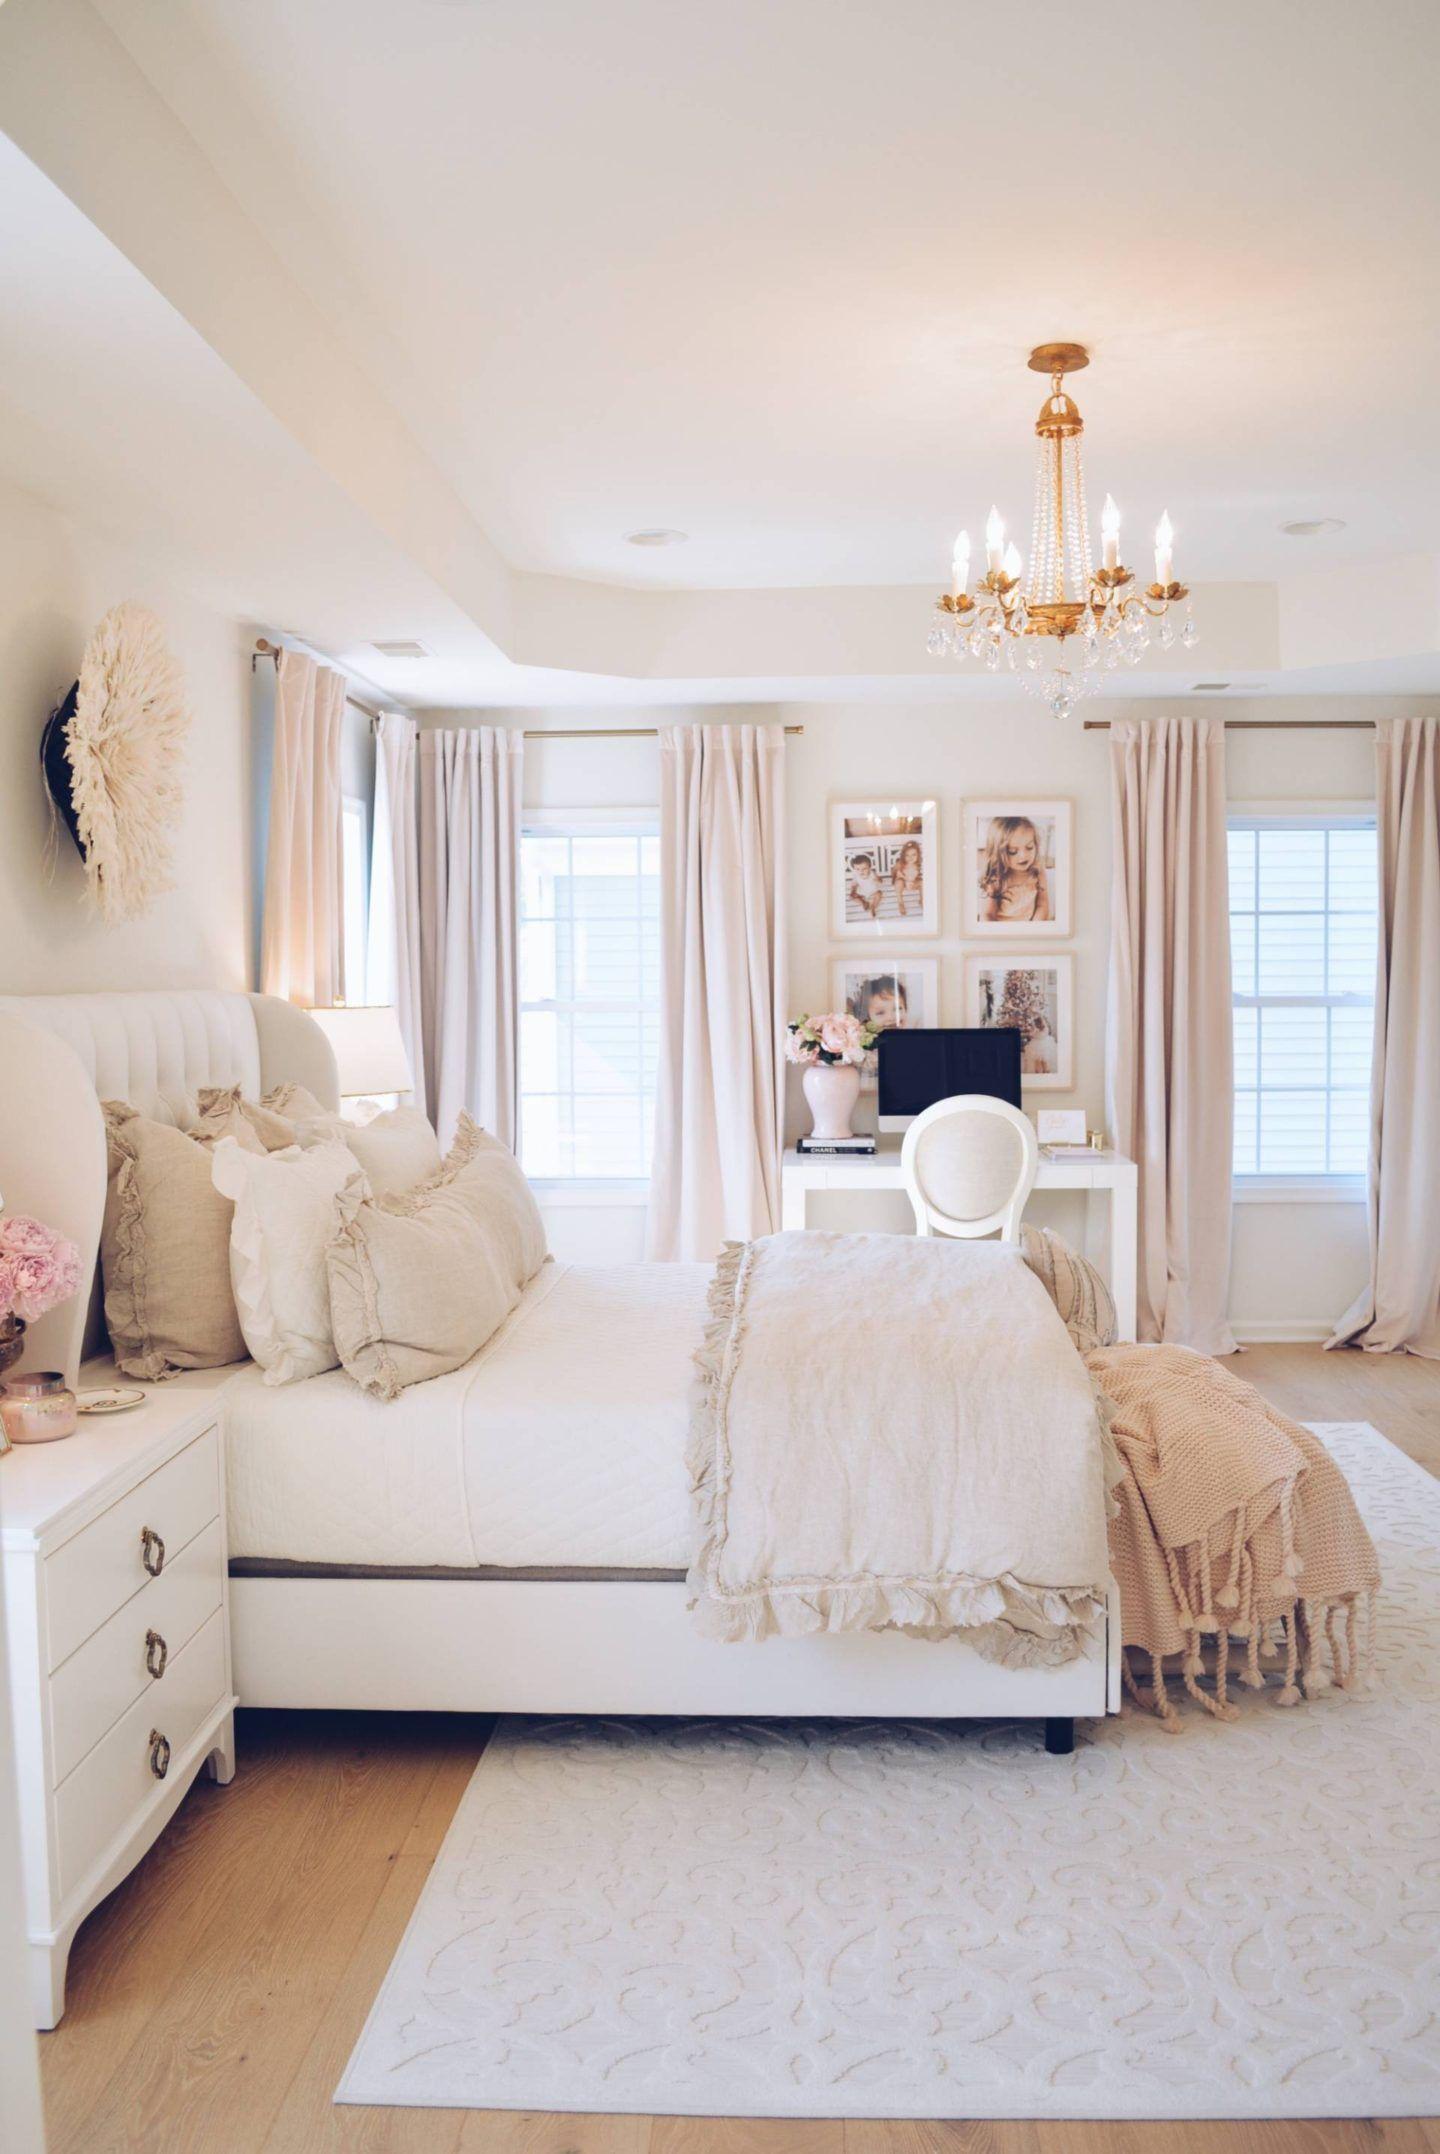 Master Bedroom Decor A Cozy Romantic Master Bedroom The Pink Dream Master Bedrooms Decor Master Bedroom Makeover Bedroom Interior